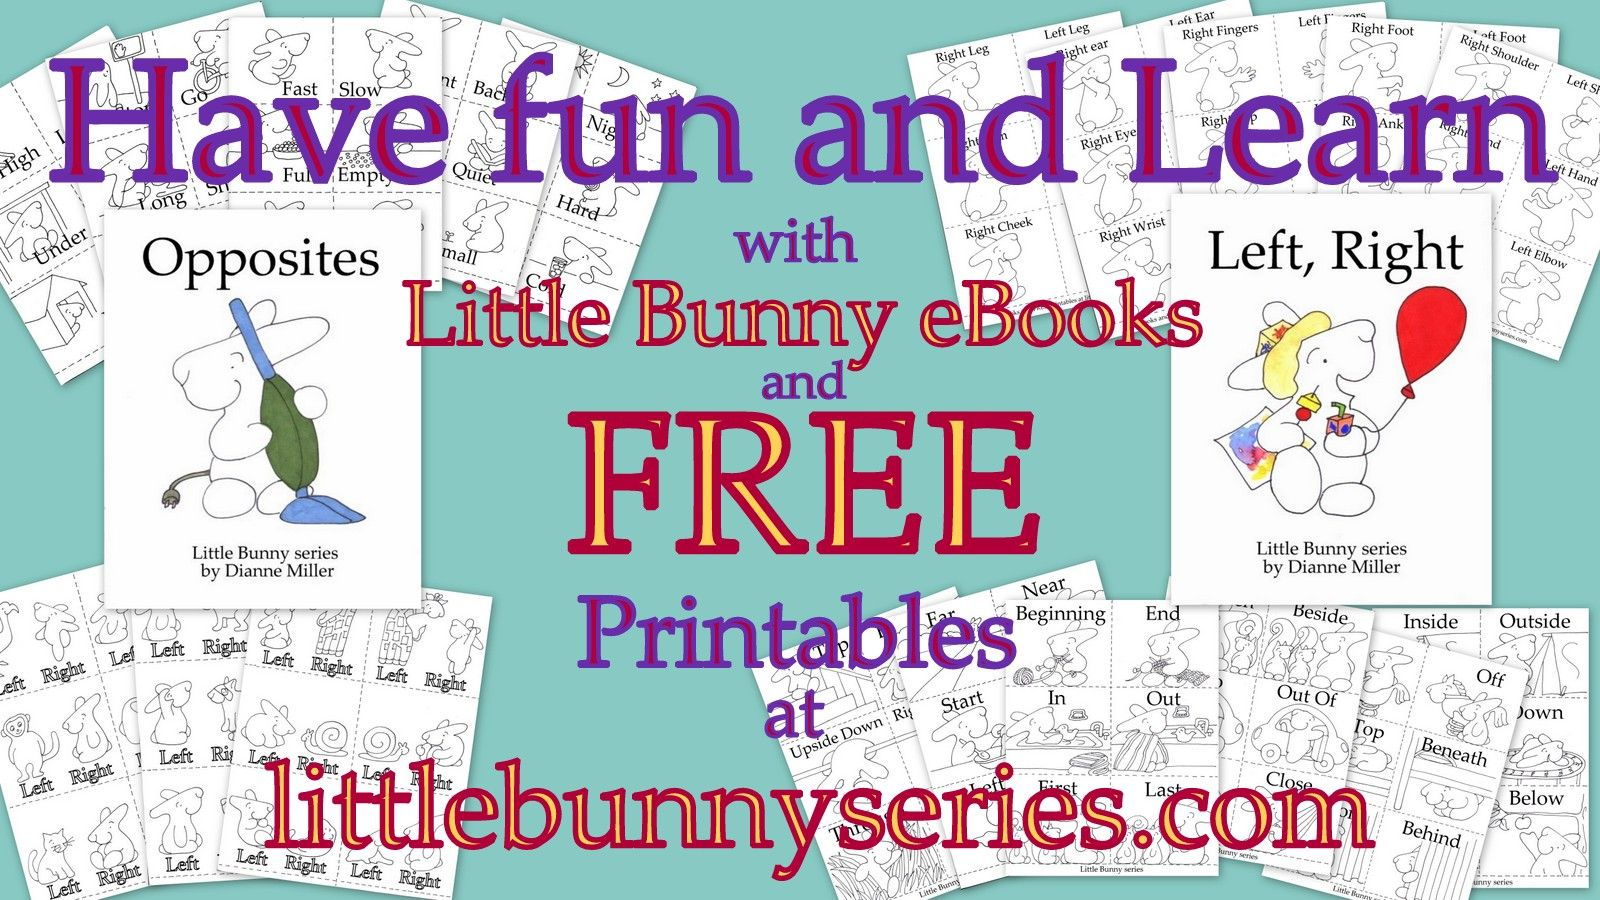 Ebooks And Hundreds Of Free Preschool Printables At Http Www Littlebunnyseries Com Free Preschool Printables Teaching Abcs Free Educational Printables [ 900 x 1600 Pixel ]